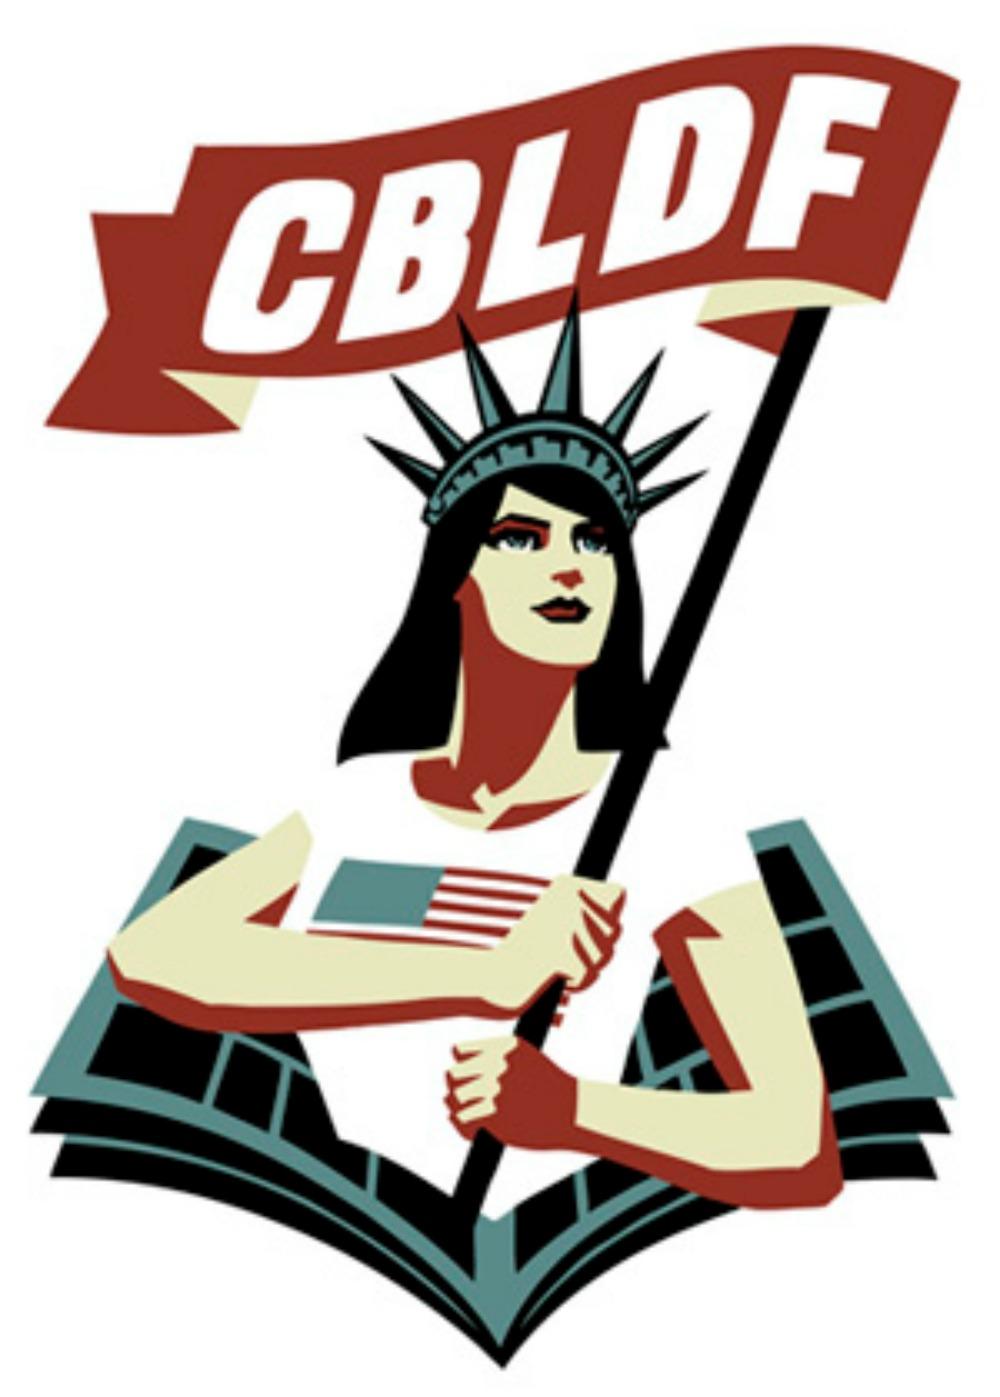 New Yorkic Con: Cbldf Banned Books Panel Recap